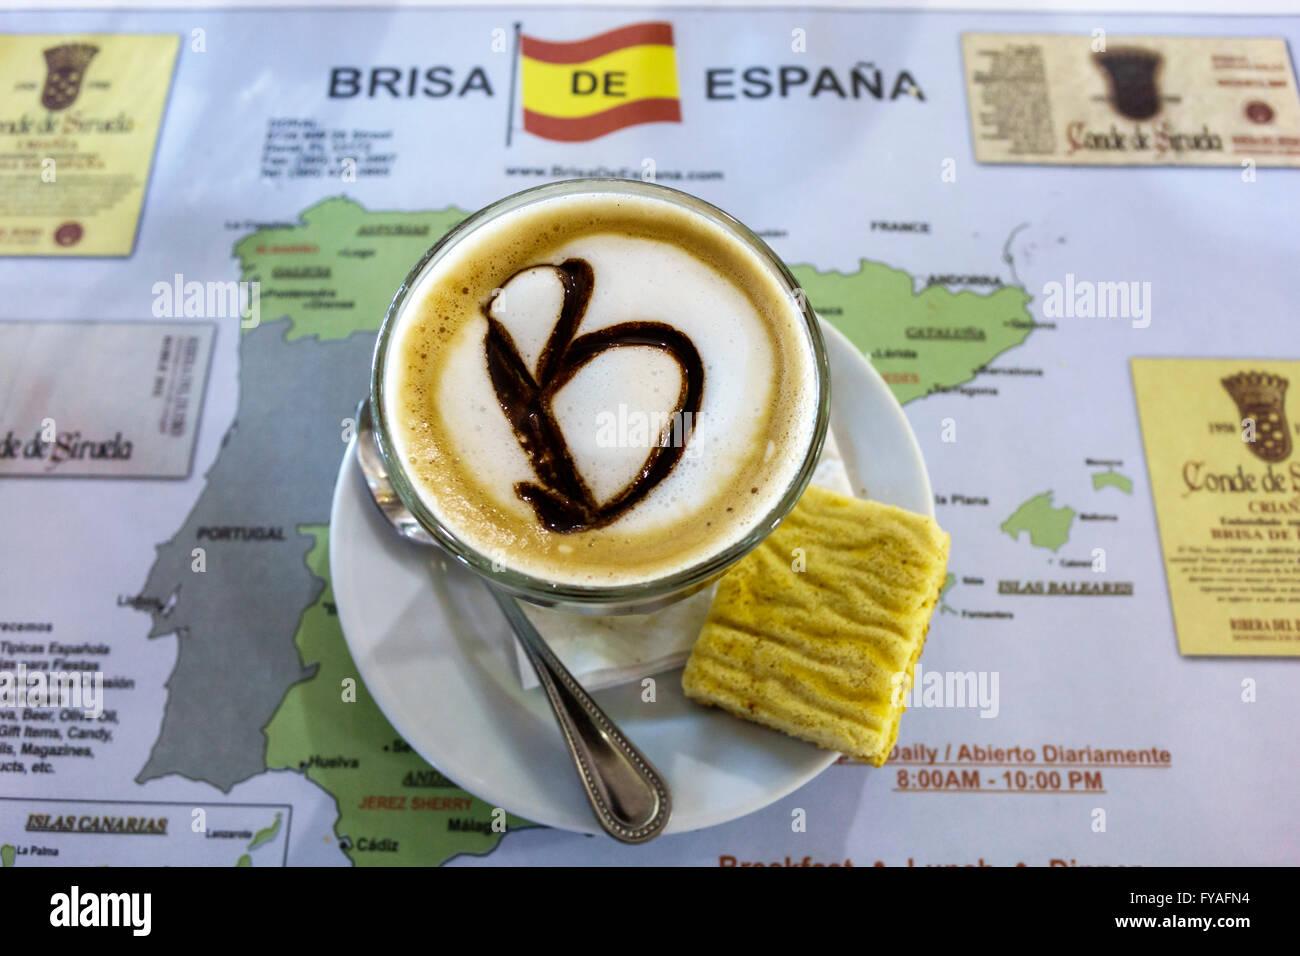 Miami Florida Doral Brisa de Espana spanischen Restaurant im Inneren trinken Cafe bonbon Espresso Kaffee Tasse Stockbild